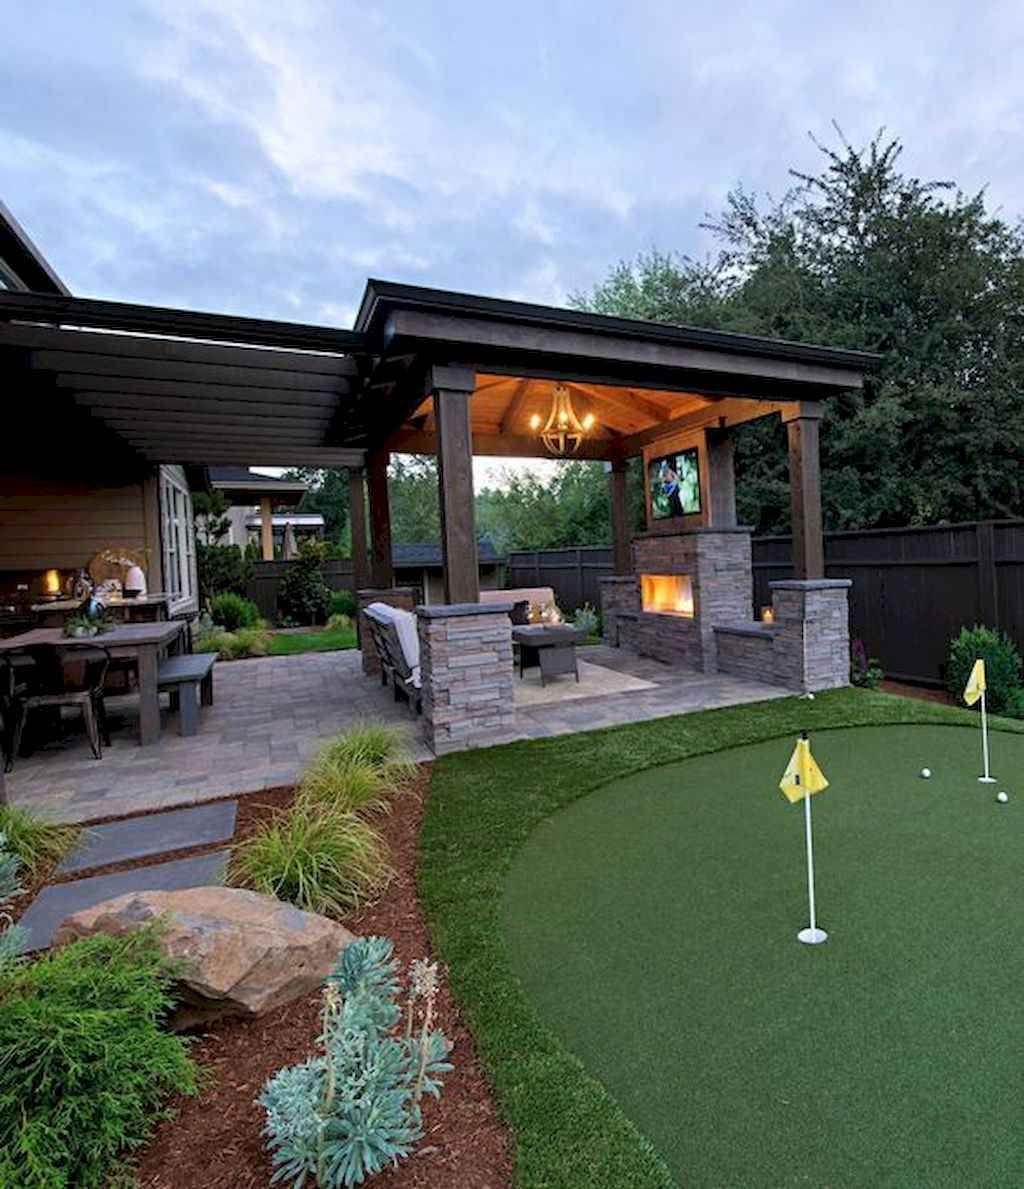 65 Amazing Backyard Garden Landscaping and Design Ideas #backyardideas